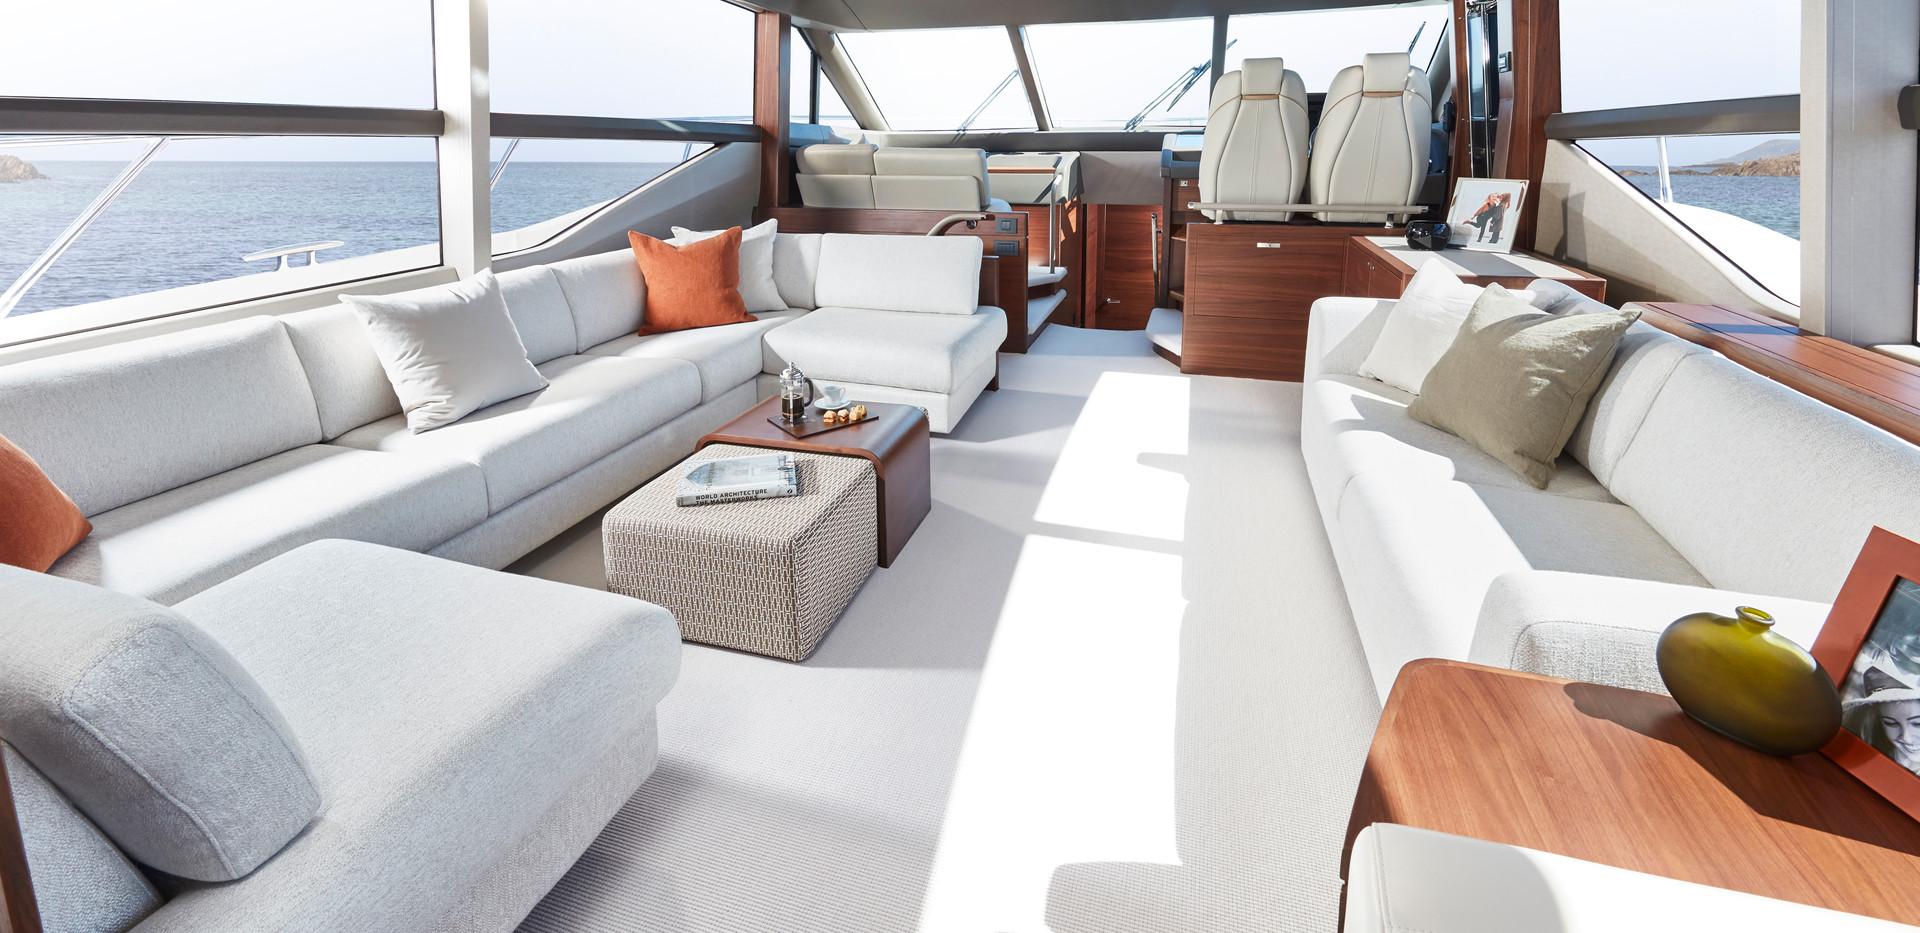 f70-interior-saloon-seating.jpg